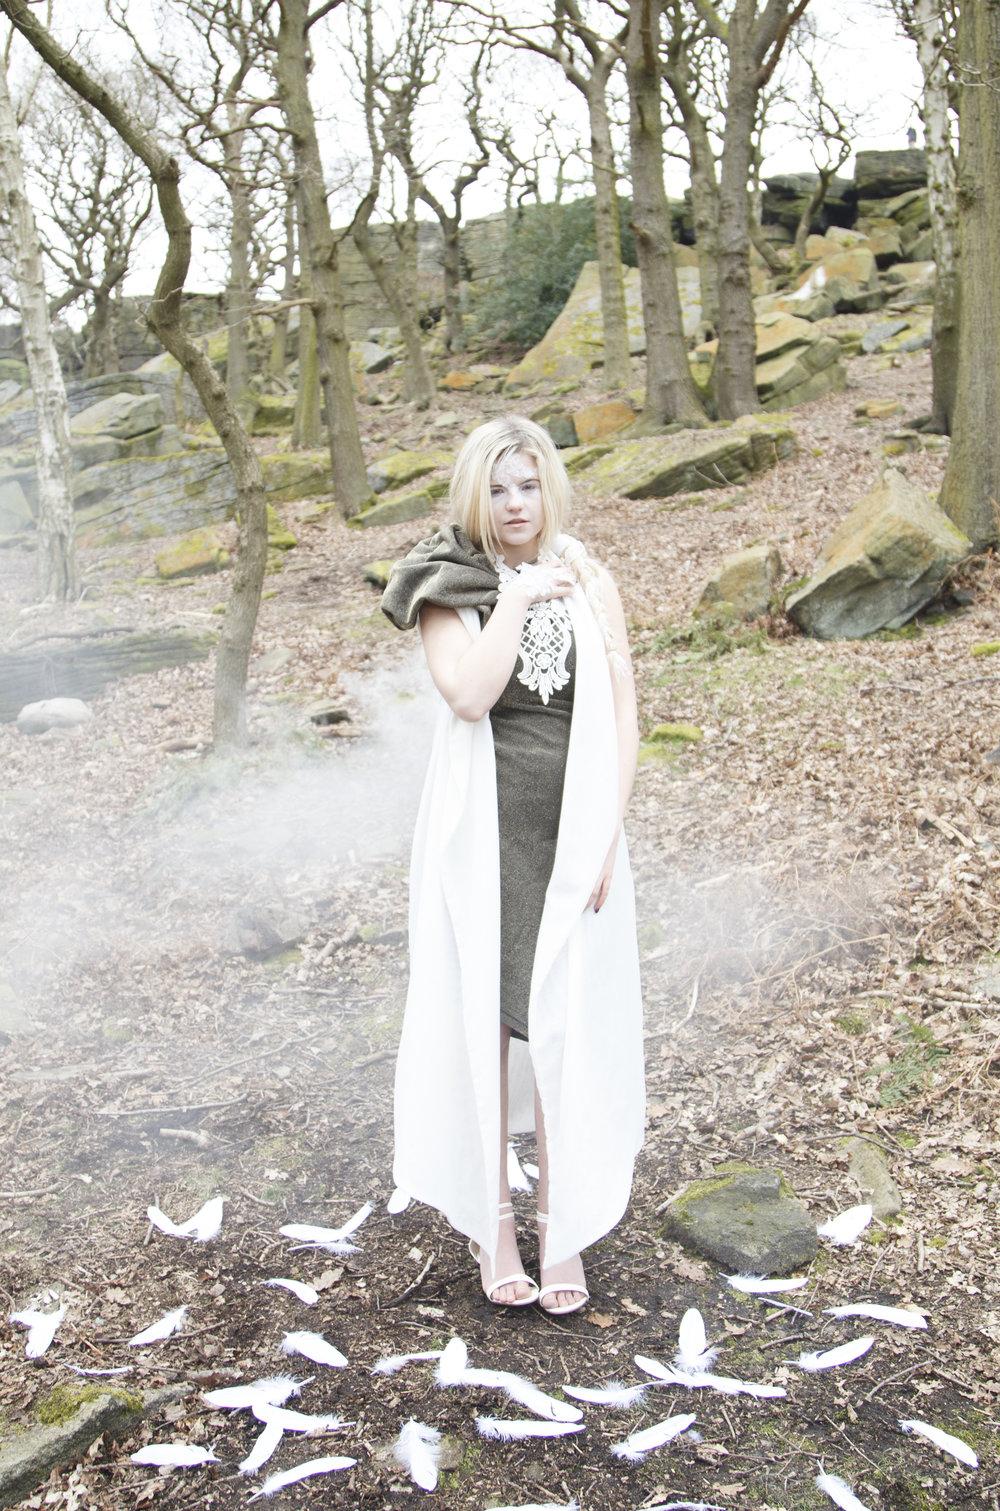 zaramia-ava-zaramiaava-leeds-fashion-designer-ethical-sustainable-smoke-versatile-drape-wrap-gold-cowl-white-dress-styling-location-womenswear-models-photoshoot-location-lace-4